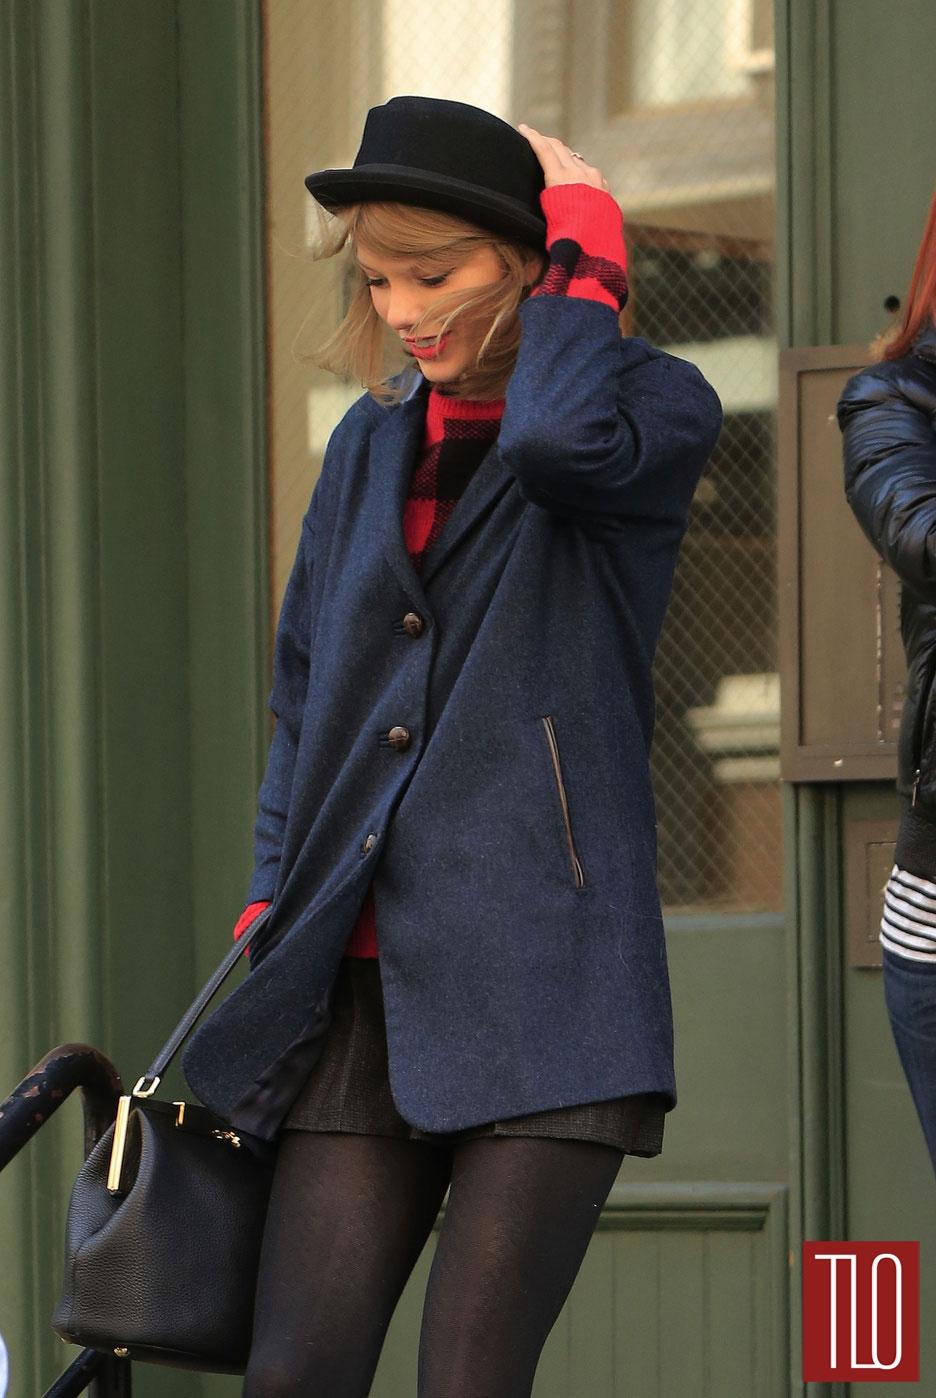 Taylor-Swift-GOTS-NYC-Topshop-RB-Tom-Lorenzo-Site-TLO (1)